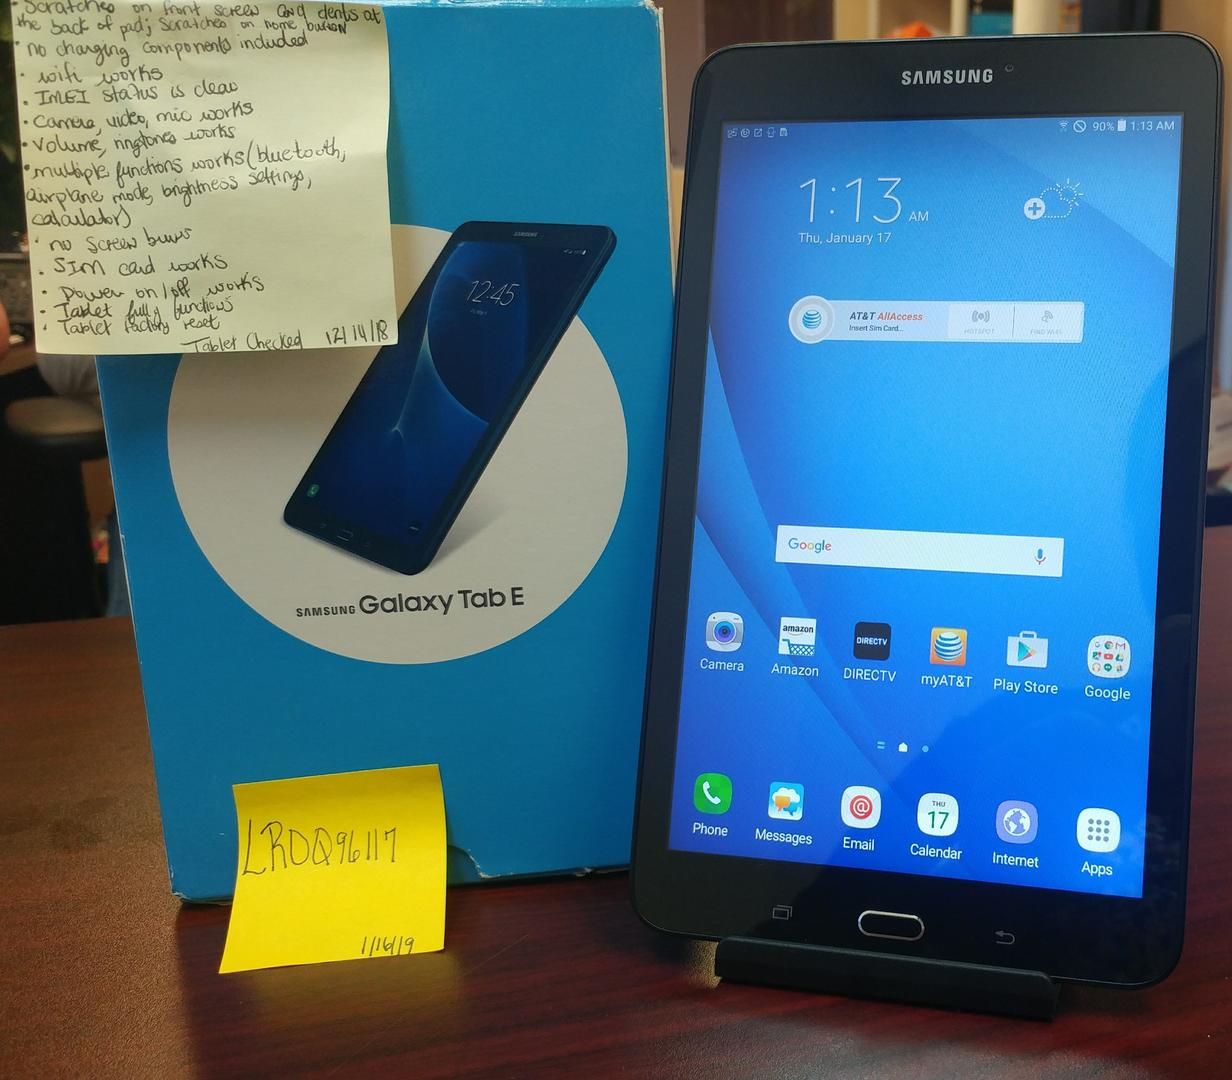 Samsung Galaxy Tab E 8 0 (AT&T) [SM-T377A] - Black, 16 GB